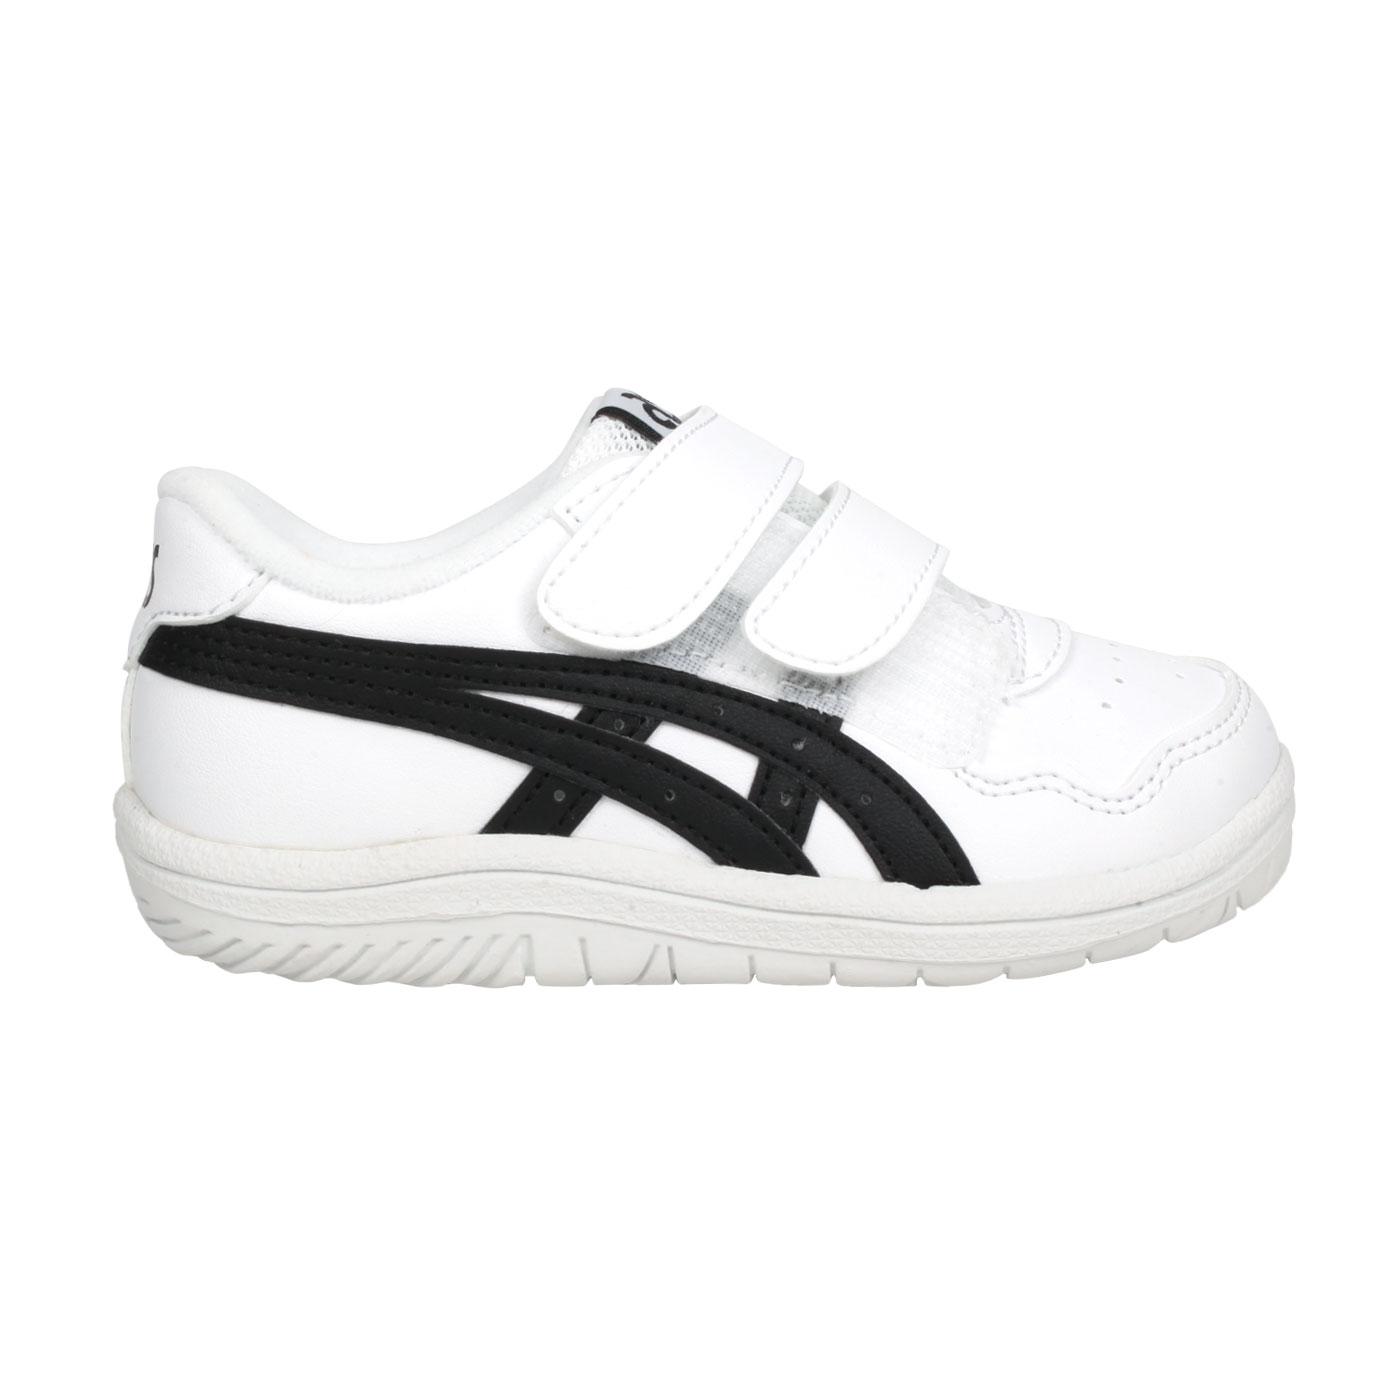 ASICS 小童休閒運動鞋  @JAPAN S TS@1194A082-139 - 白黑